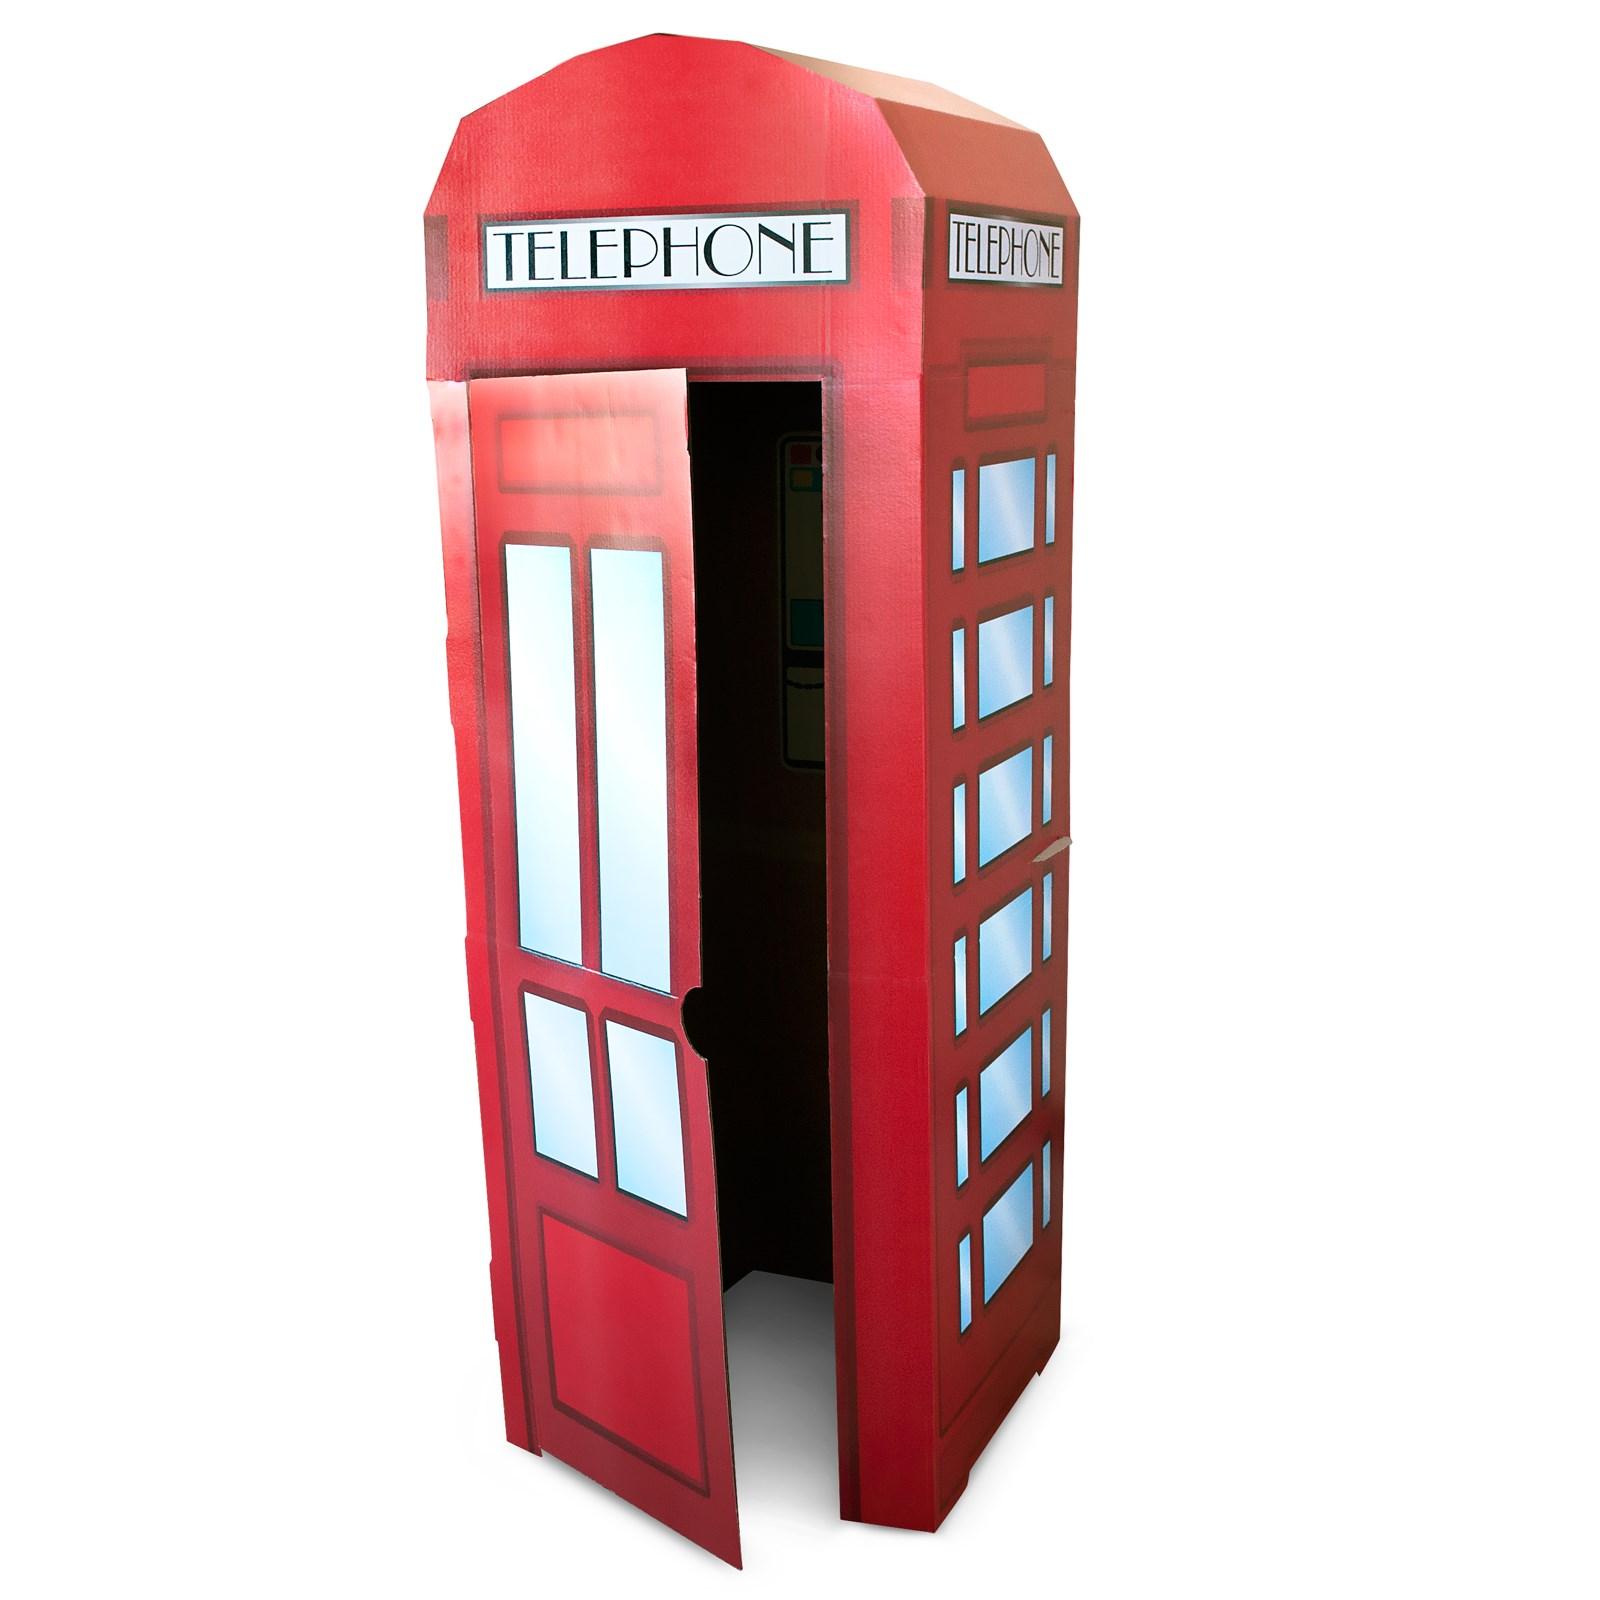 Superhero Phone Booth - 6' Tall